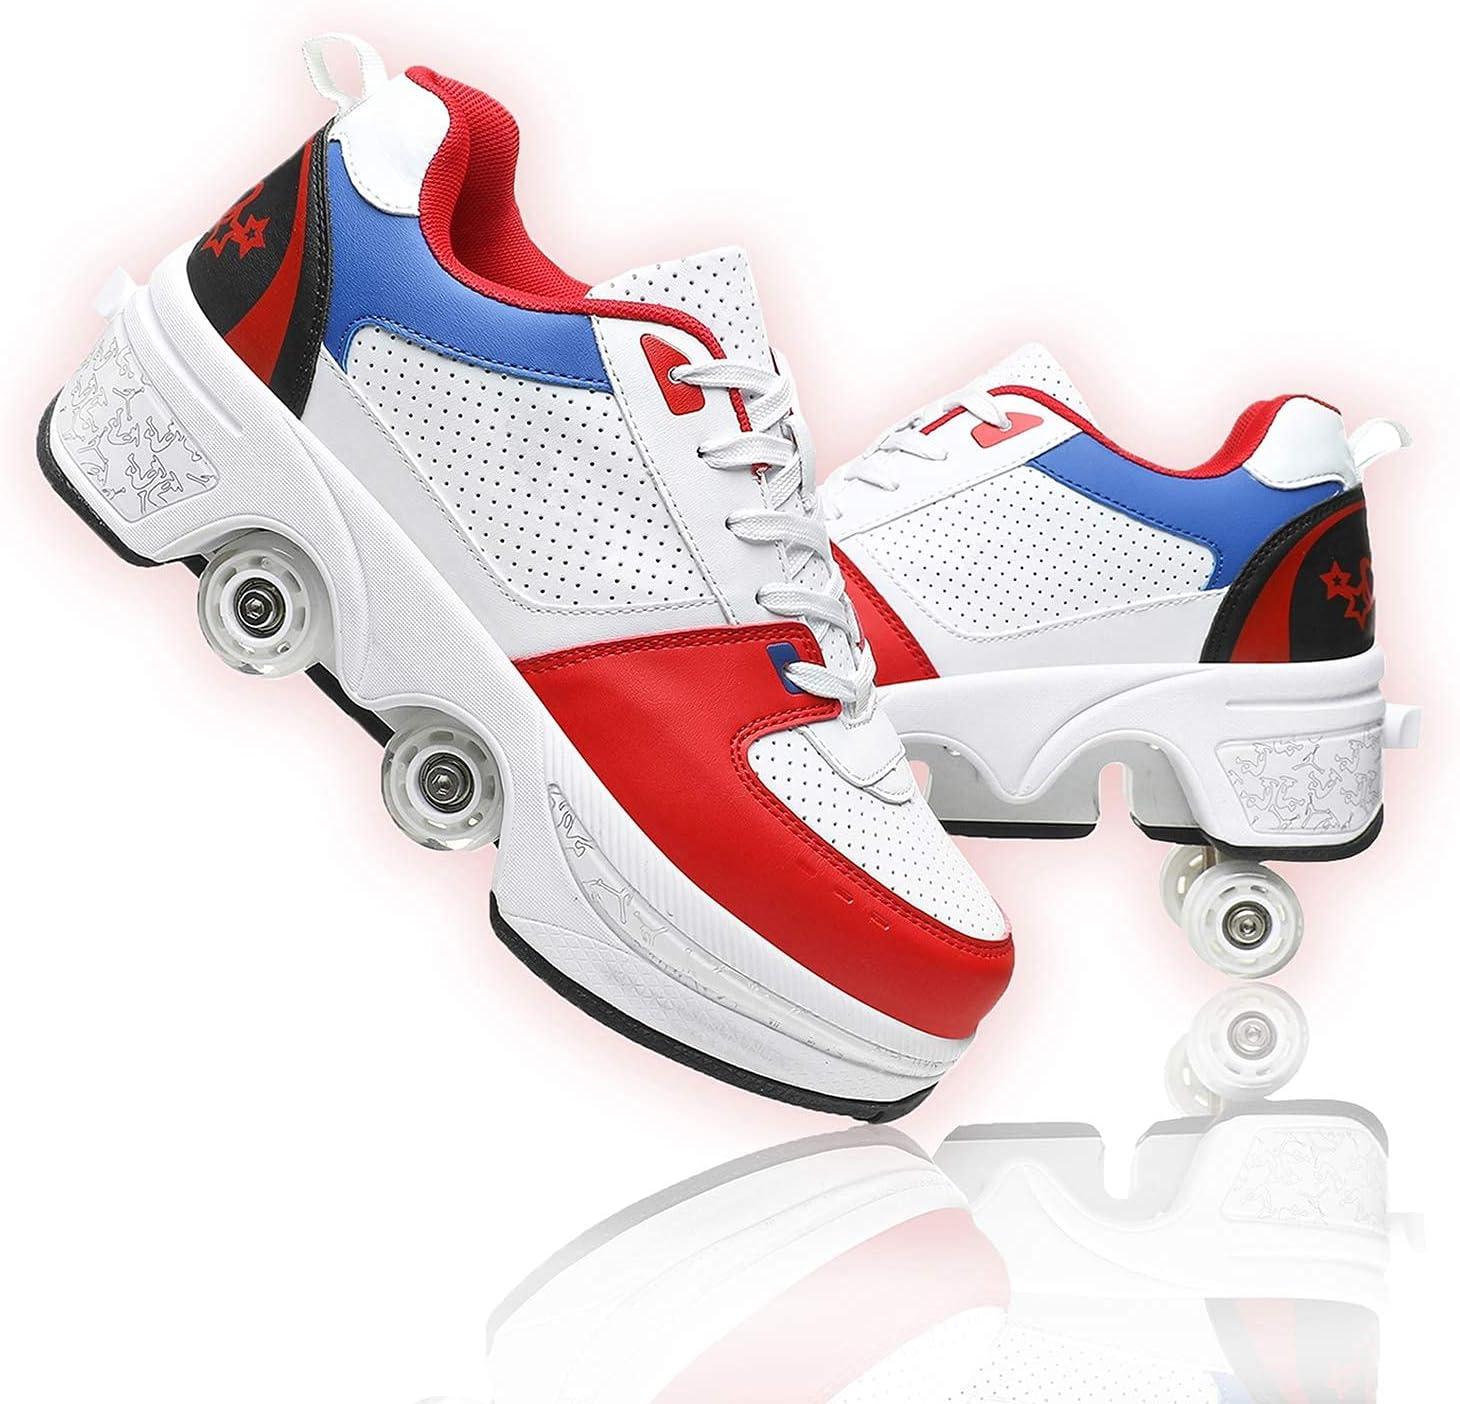 Genuine ZXMD 2-in-1 Roller Skates Automatic Walking De Deformation Overseas parallel import regular item Shoes